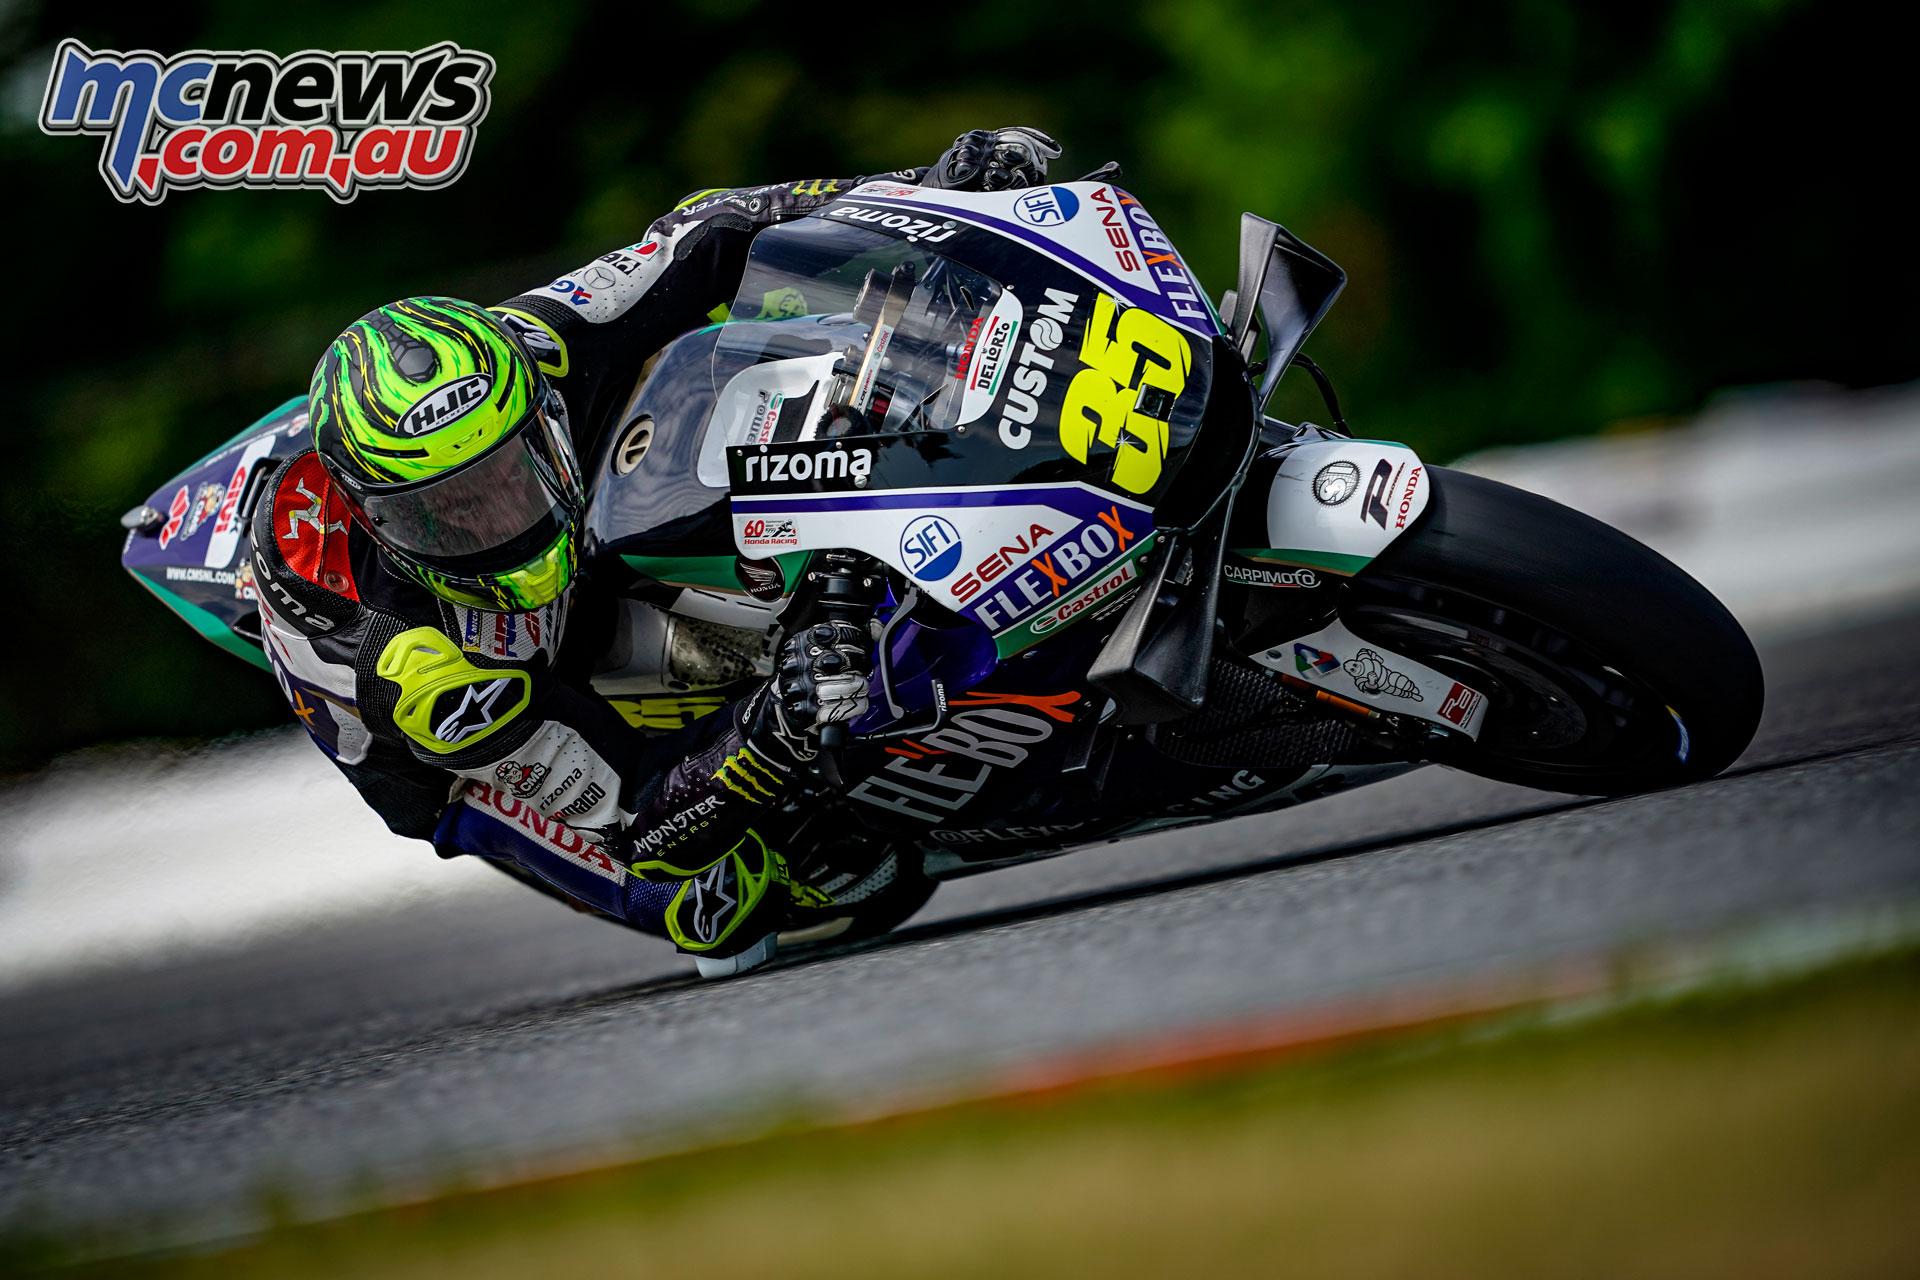 MotoGP Brno Test Cal Crutchlow AX